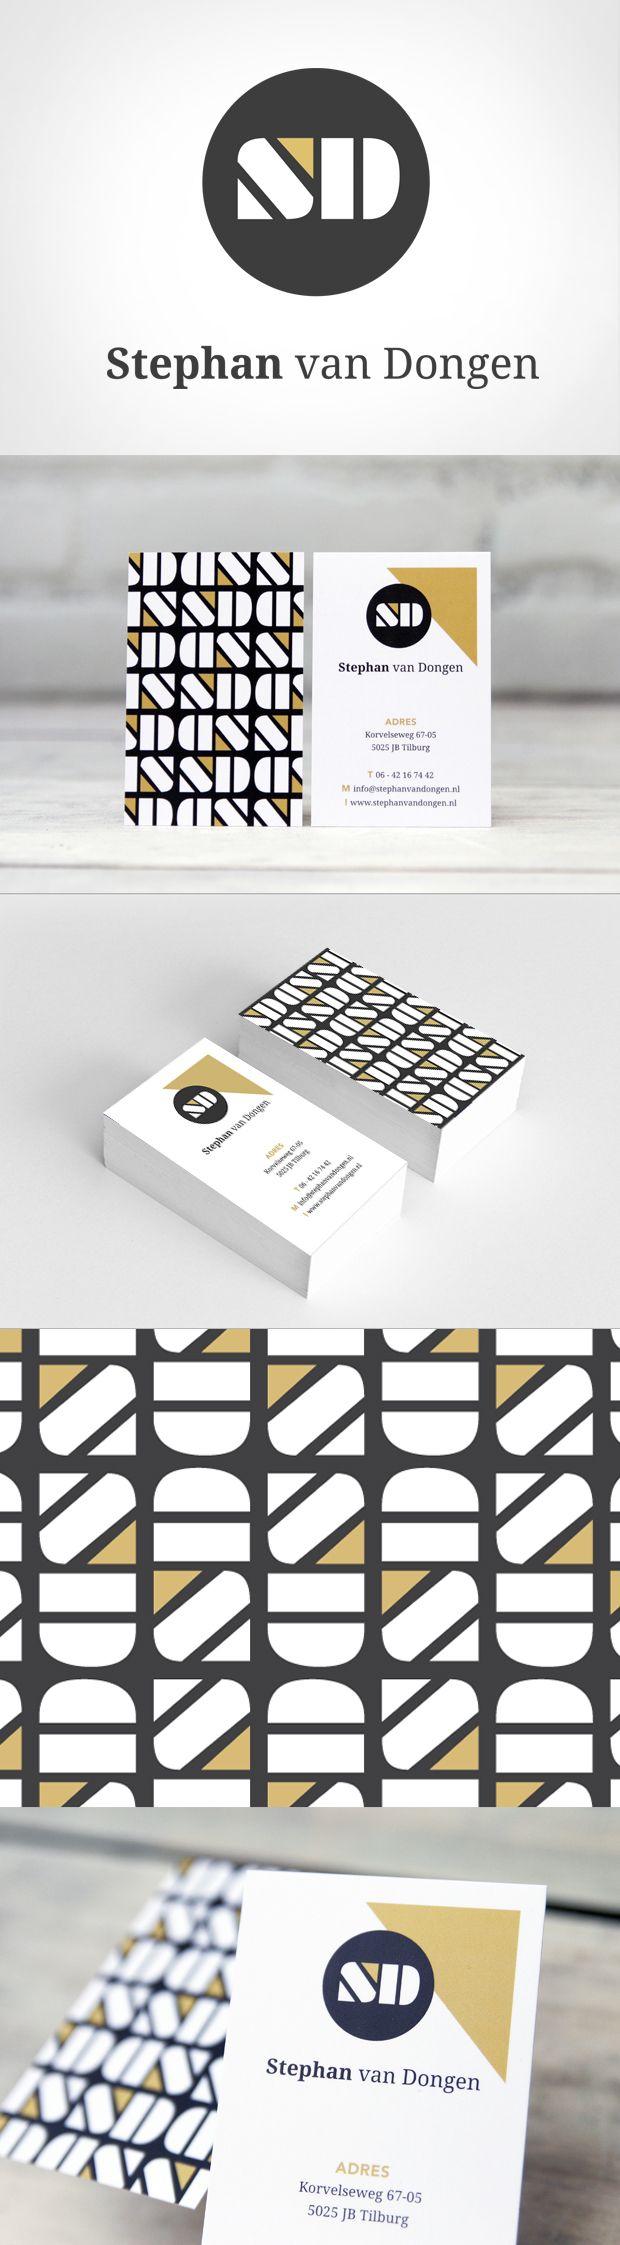 Stoer logo, moderne huisstijl in zwart en goud.